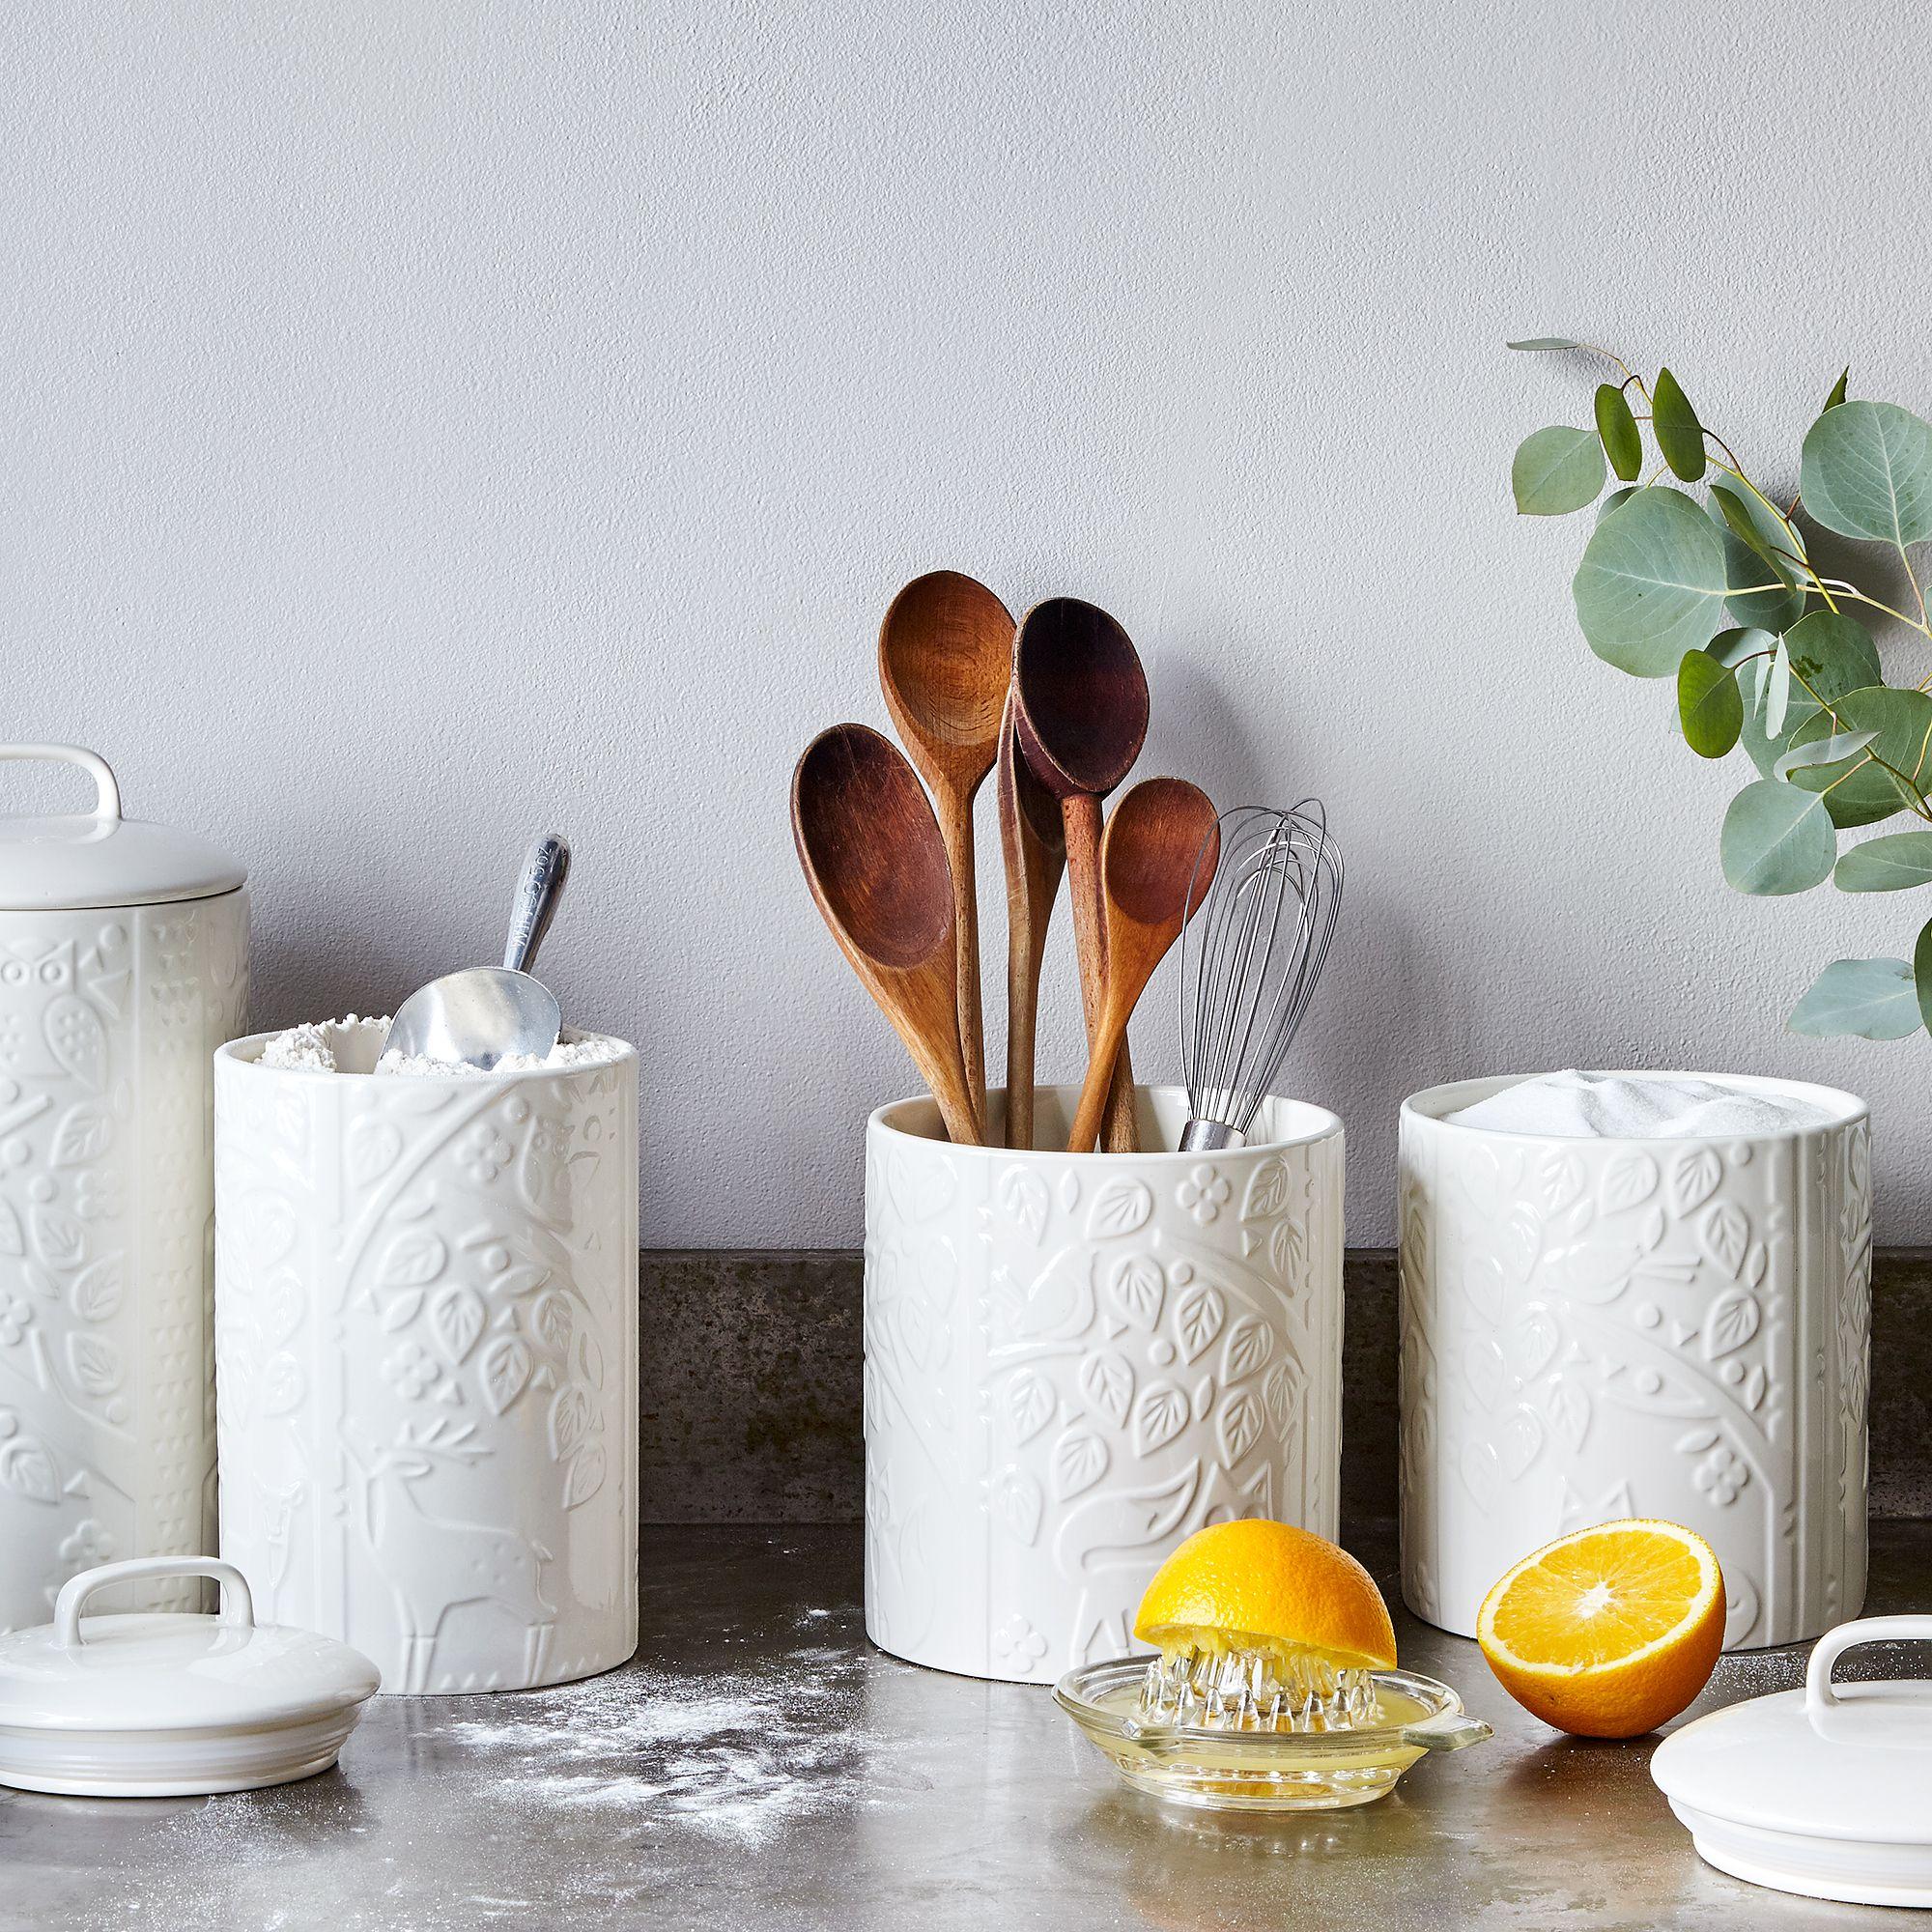 kitchen crock remodel cincinnati mason cash forest on food52